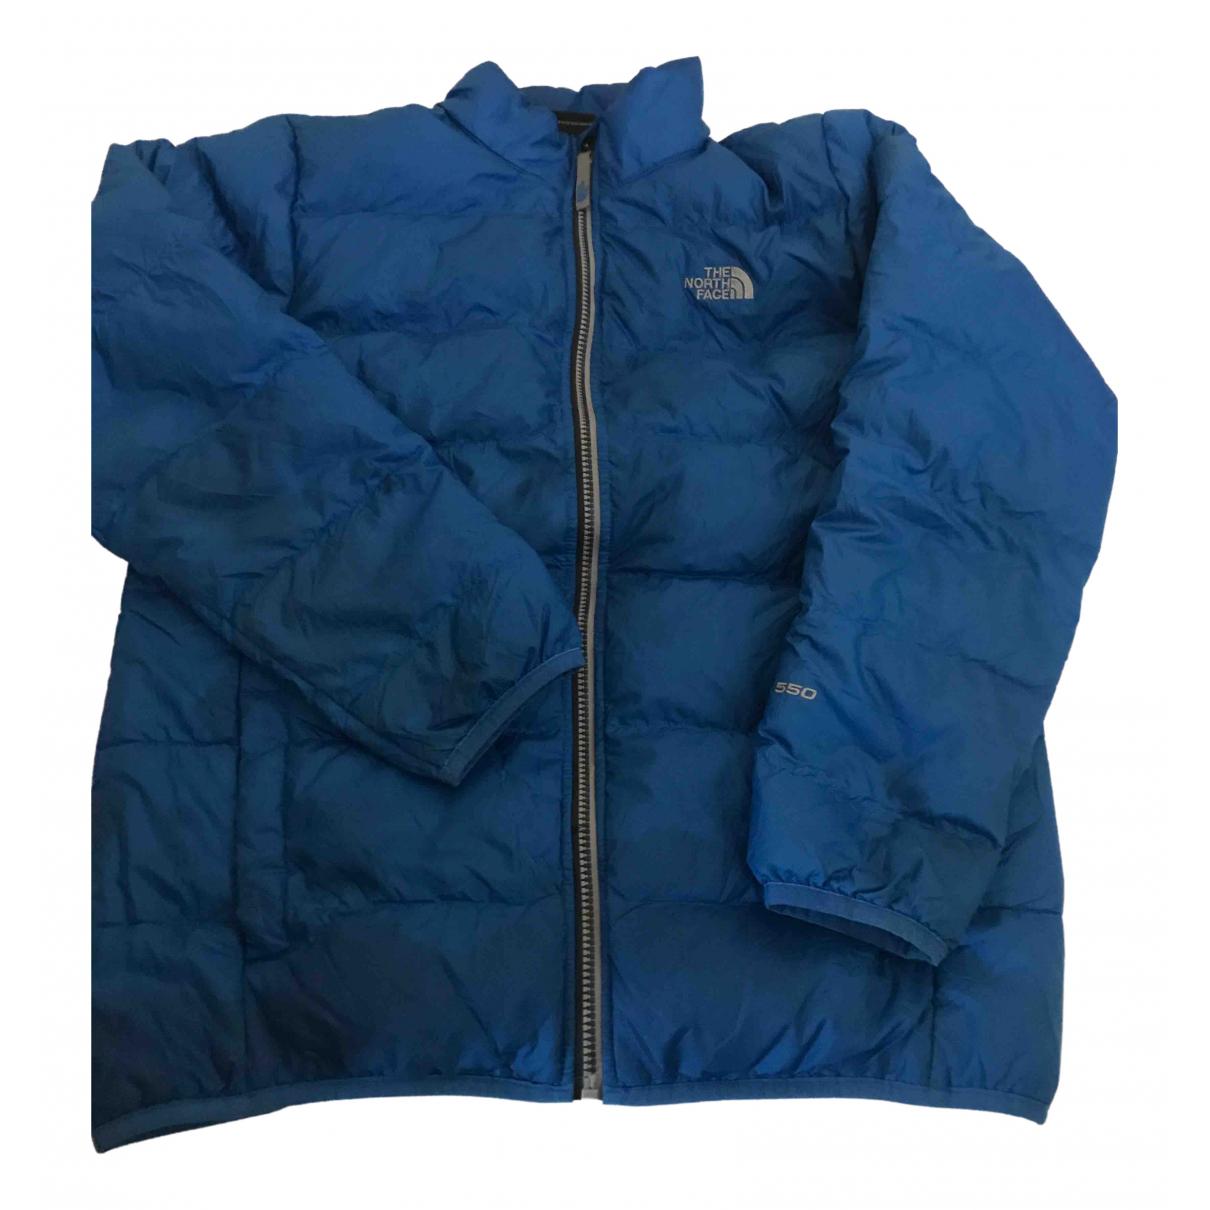 The North Face \N Blue jacket  for Men XL International